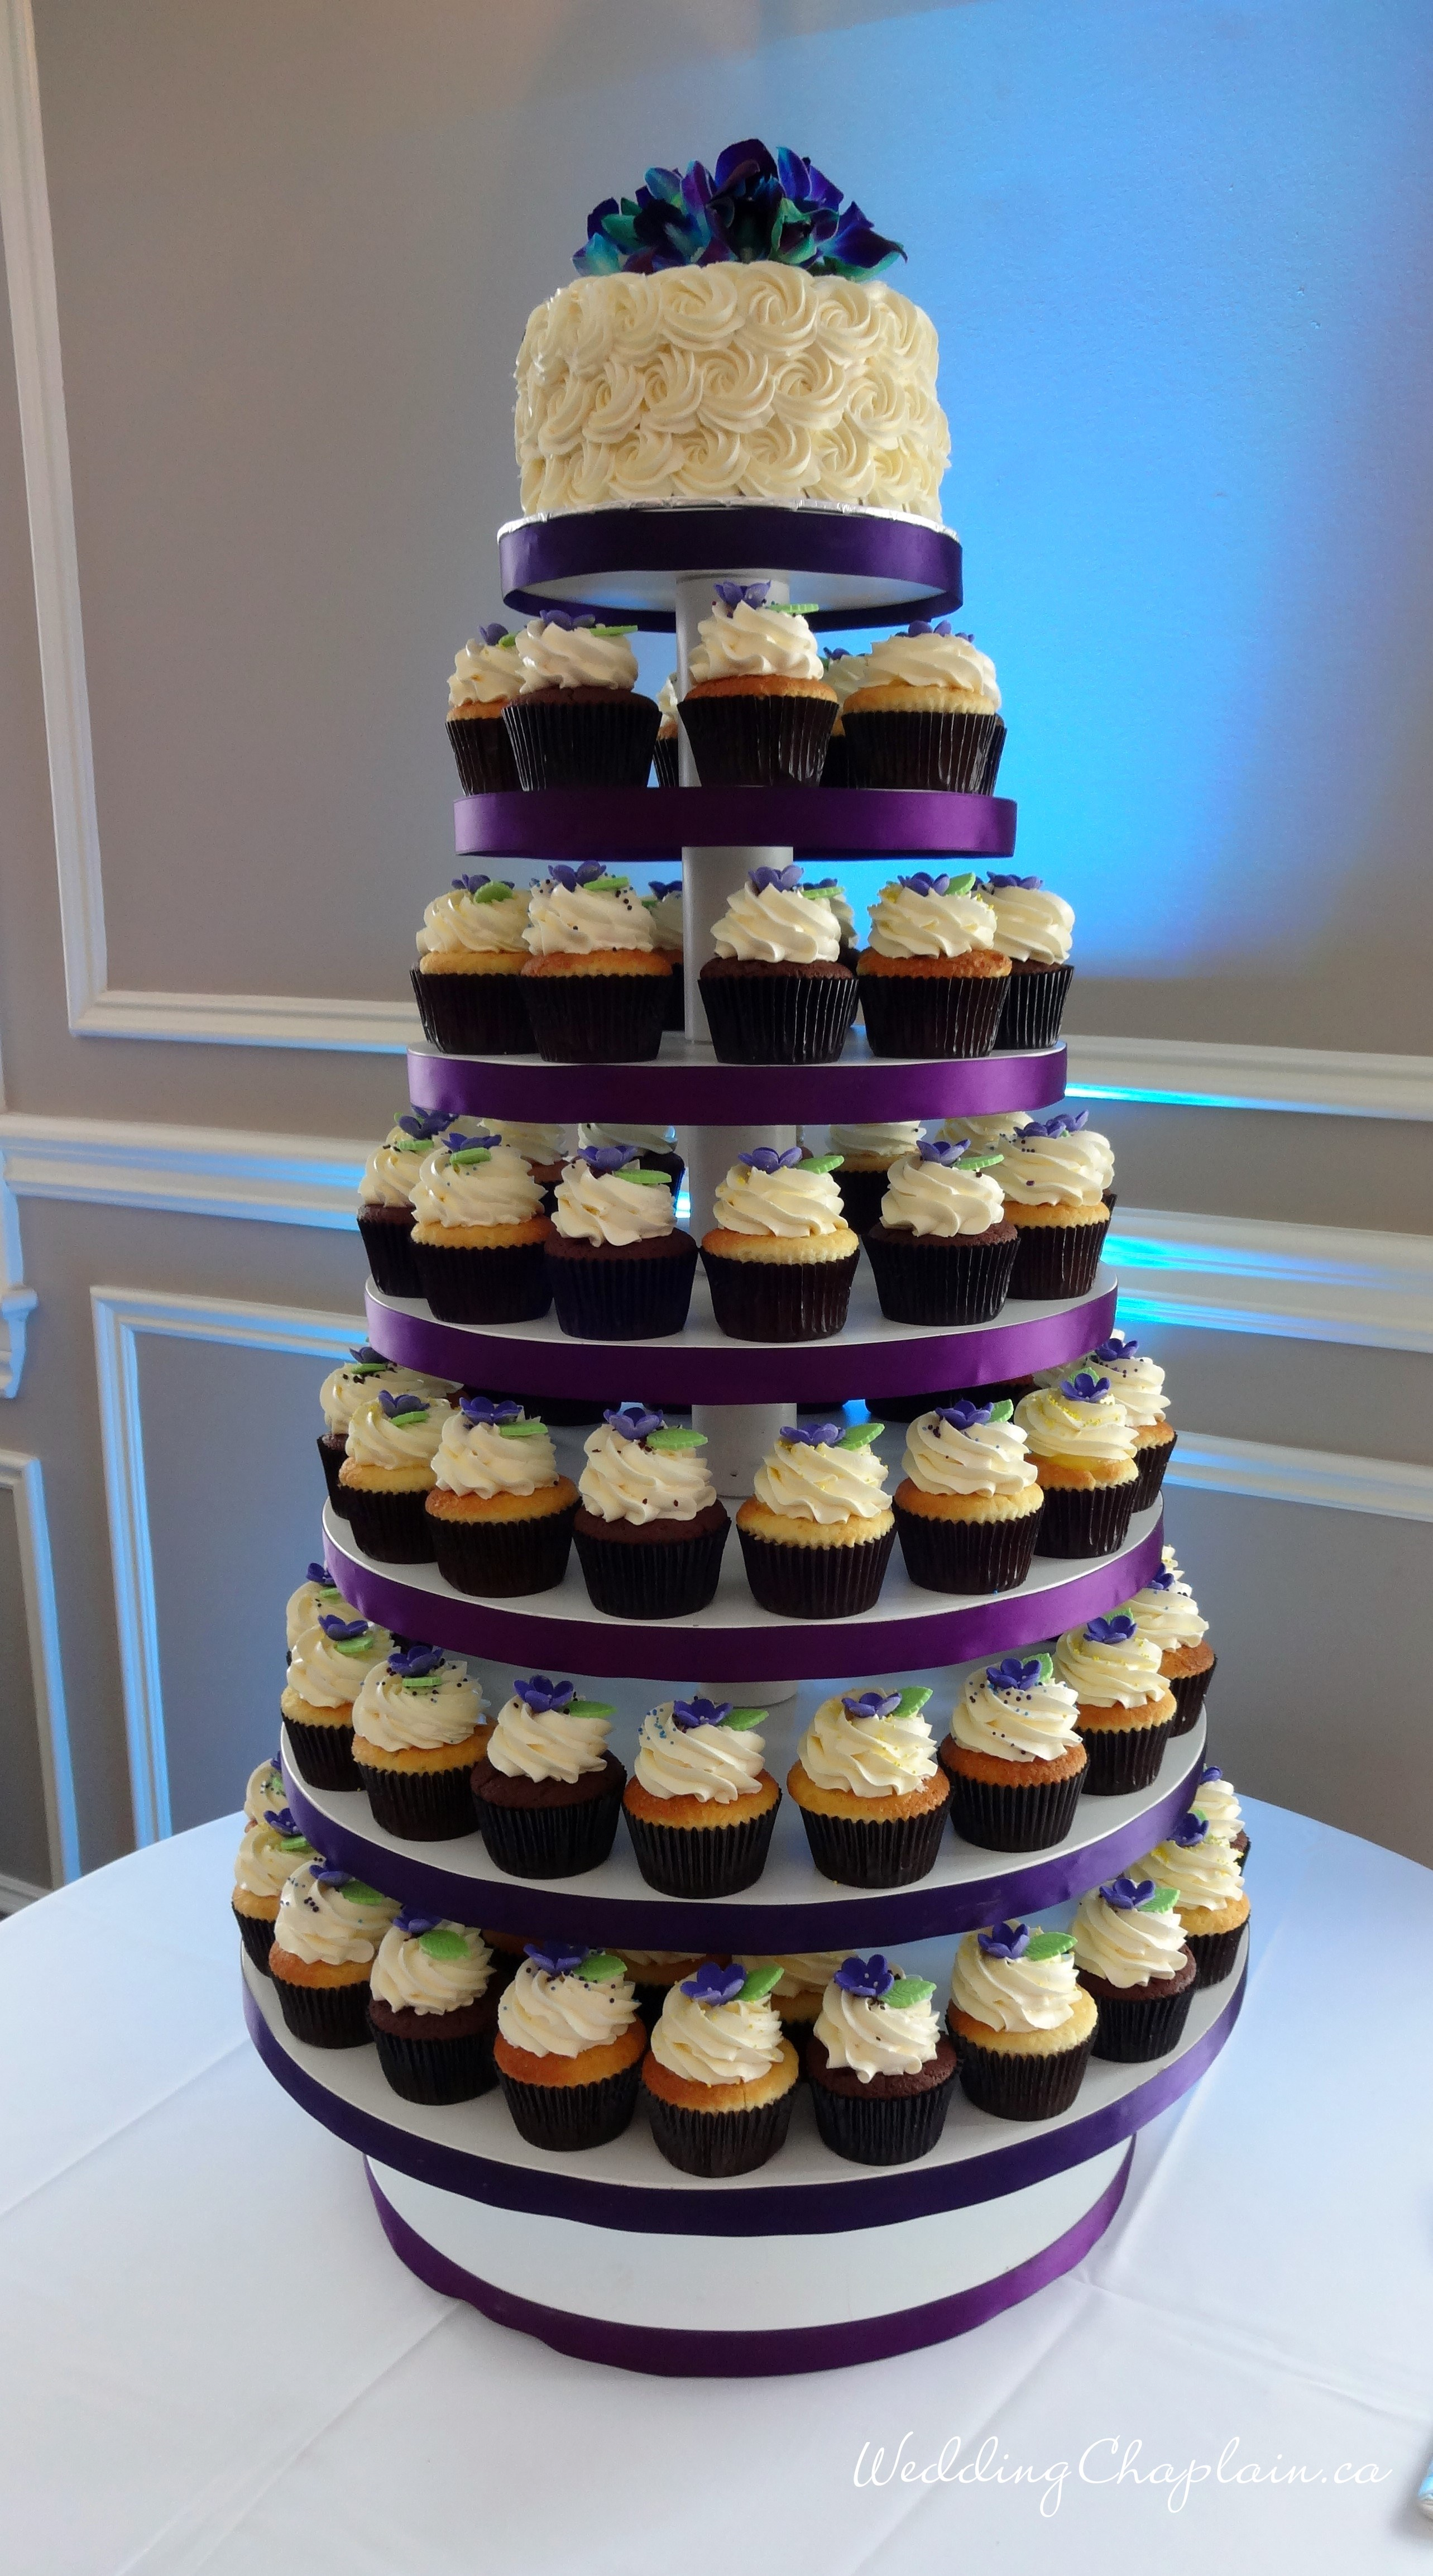 https://www.ottawaweddingmagazine.com/wp-content/uploads/2014/12/cake3.jpg